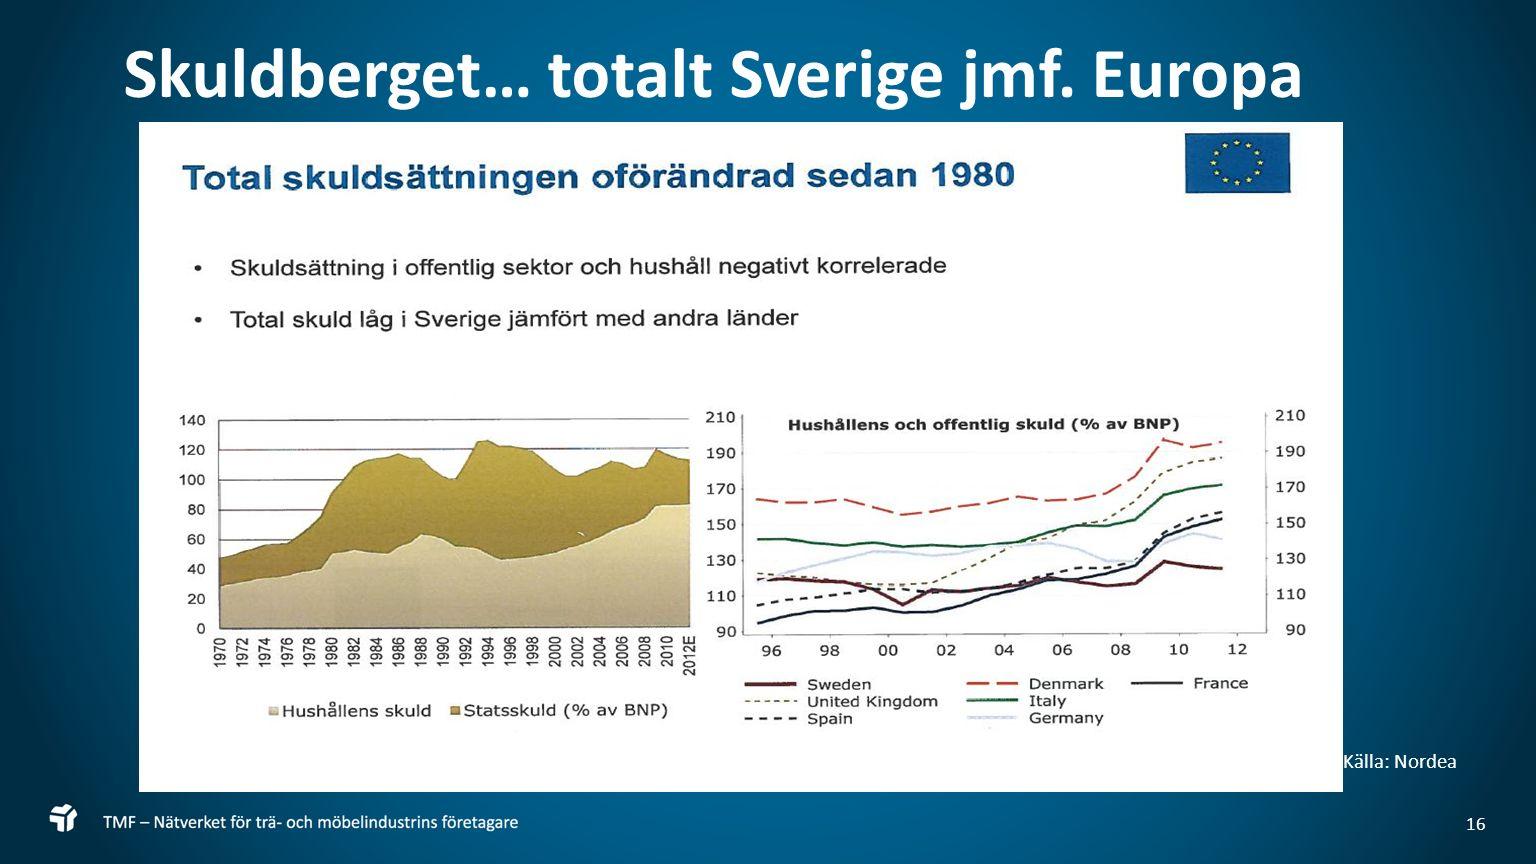 16 Skuldberget… totalt Sverige jmf. Europa Källa: Nordea